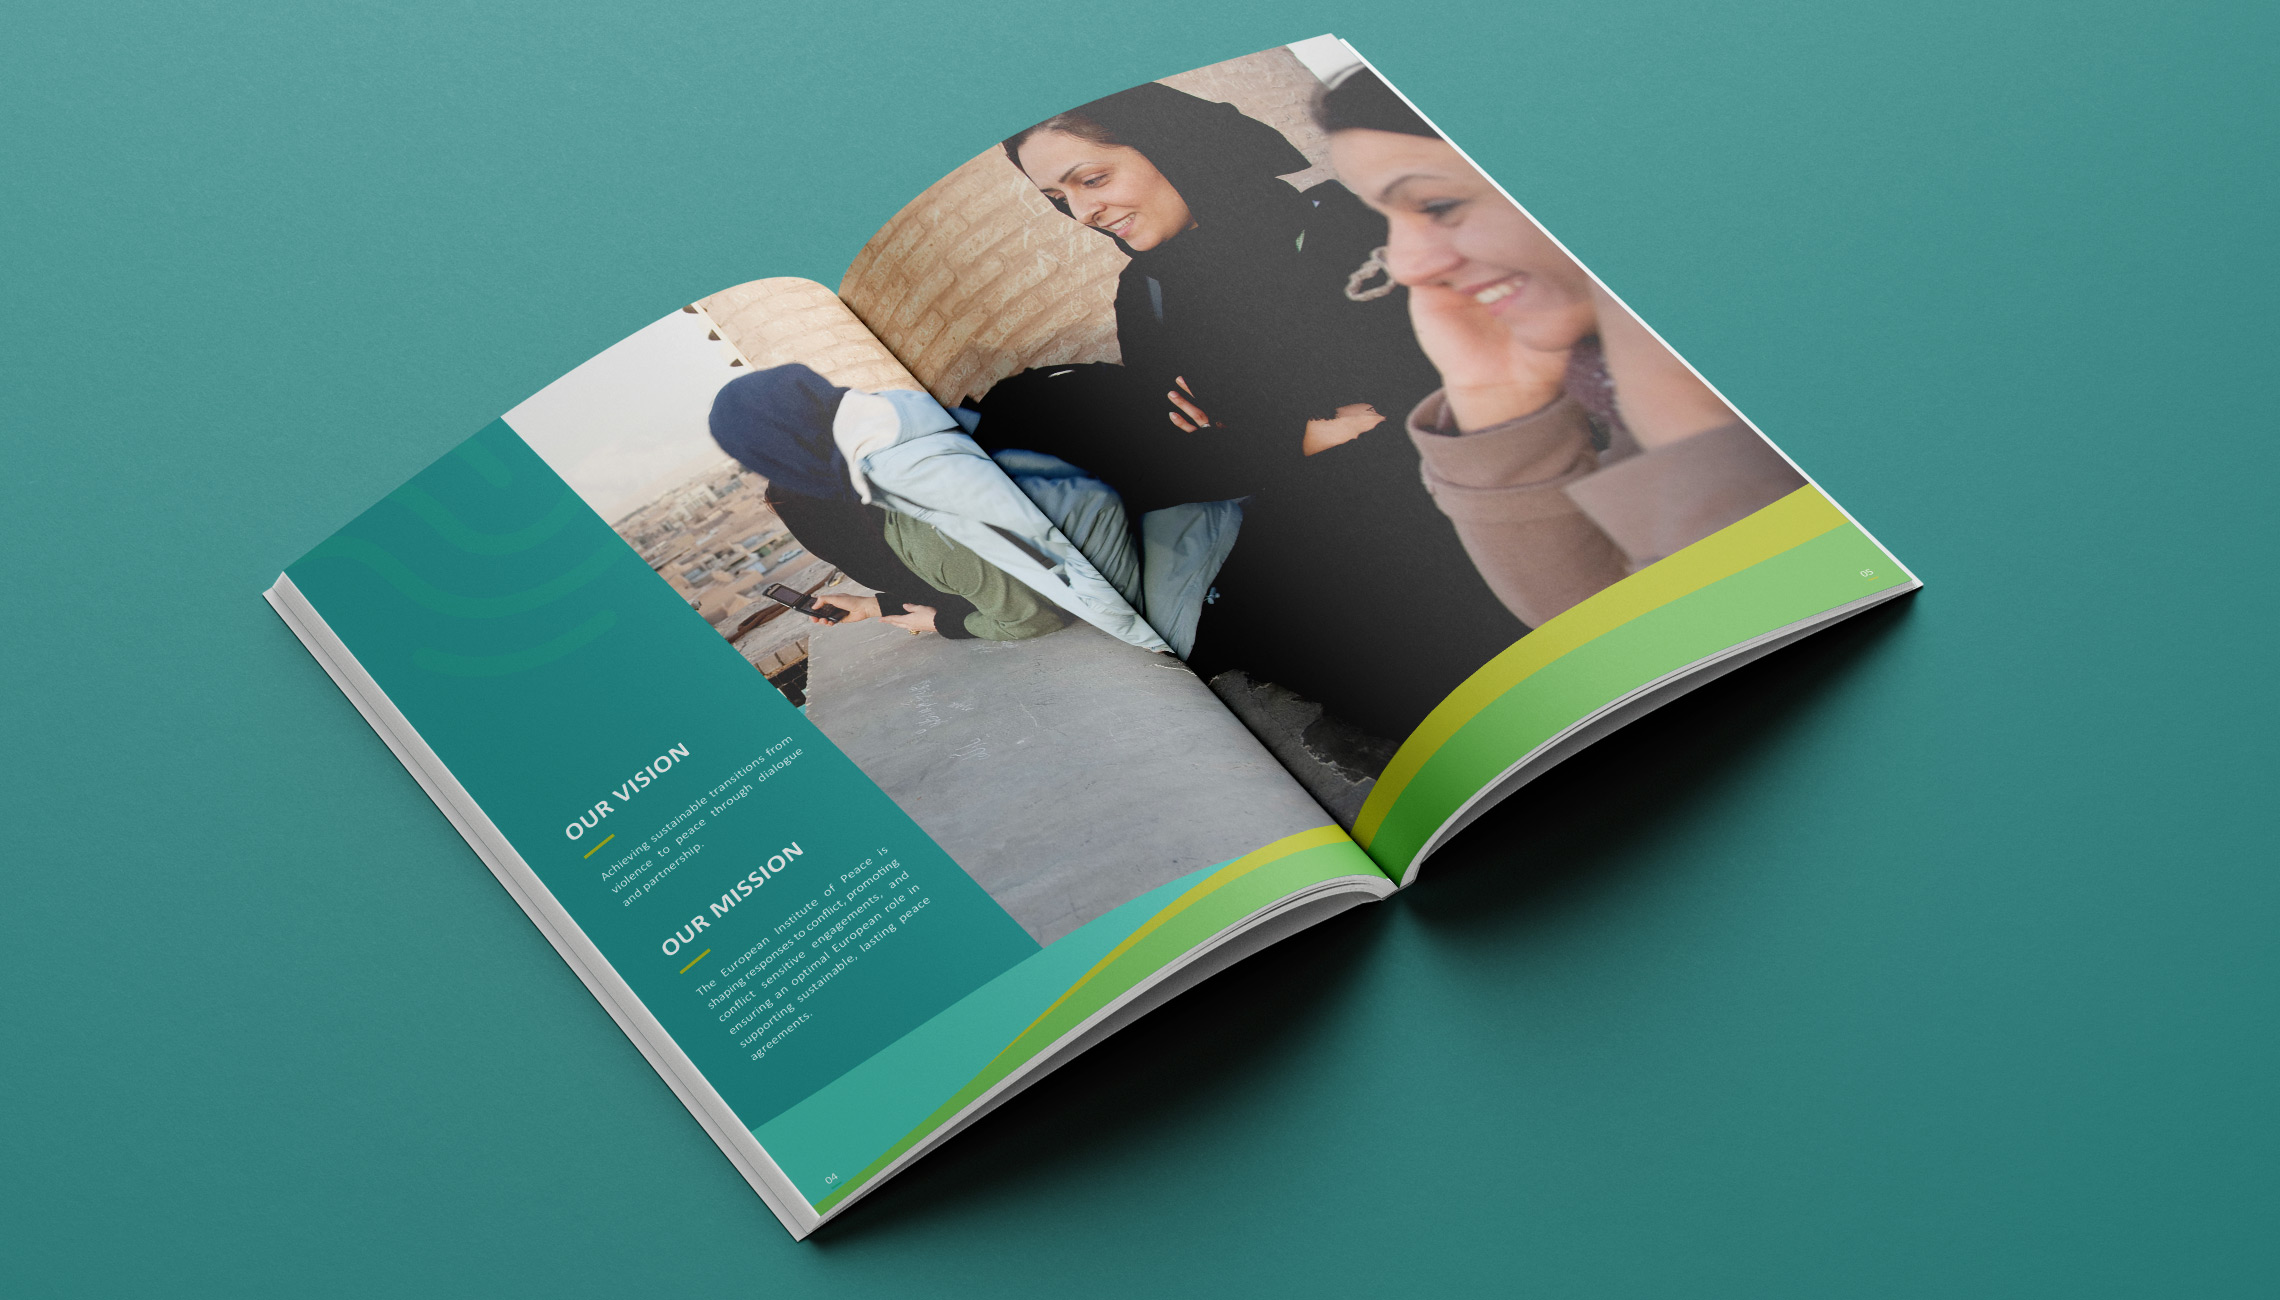 publication: Design of Strategic plan - image 3